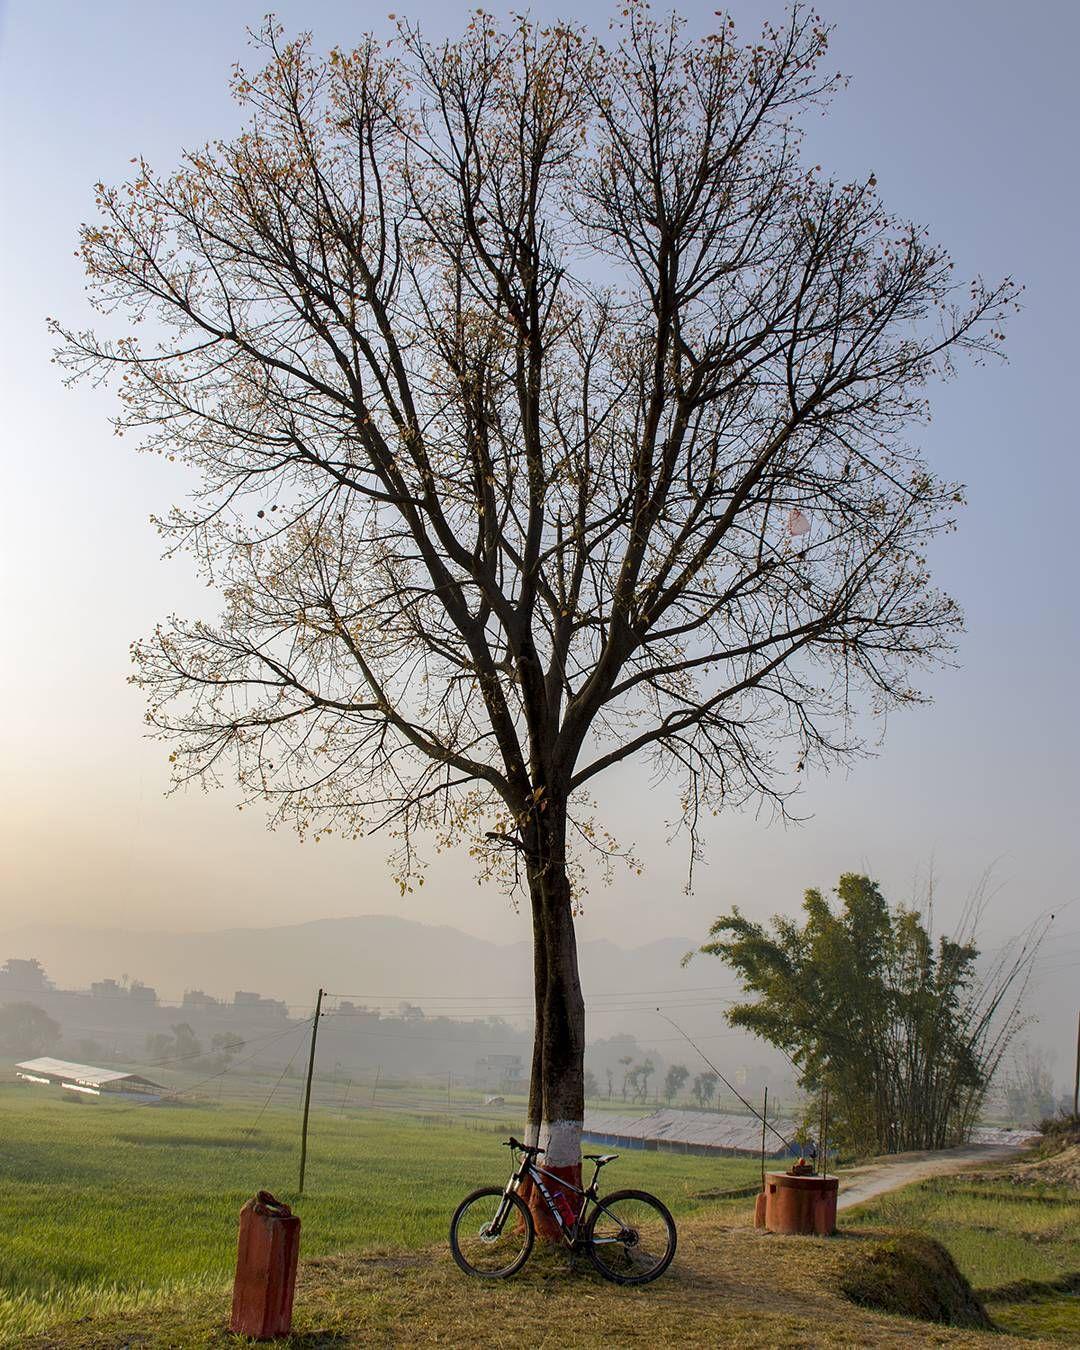 Good morning from Madhyapur Thimi…